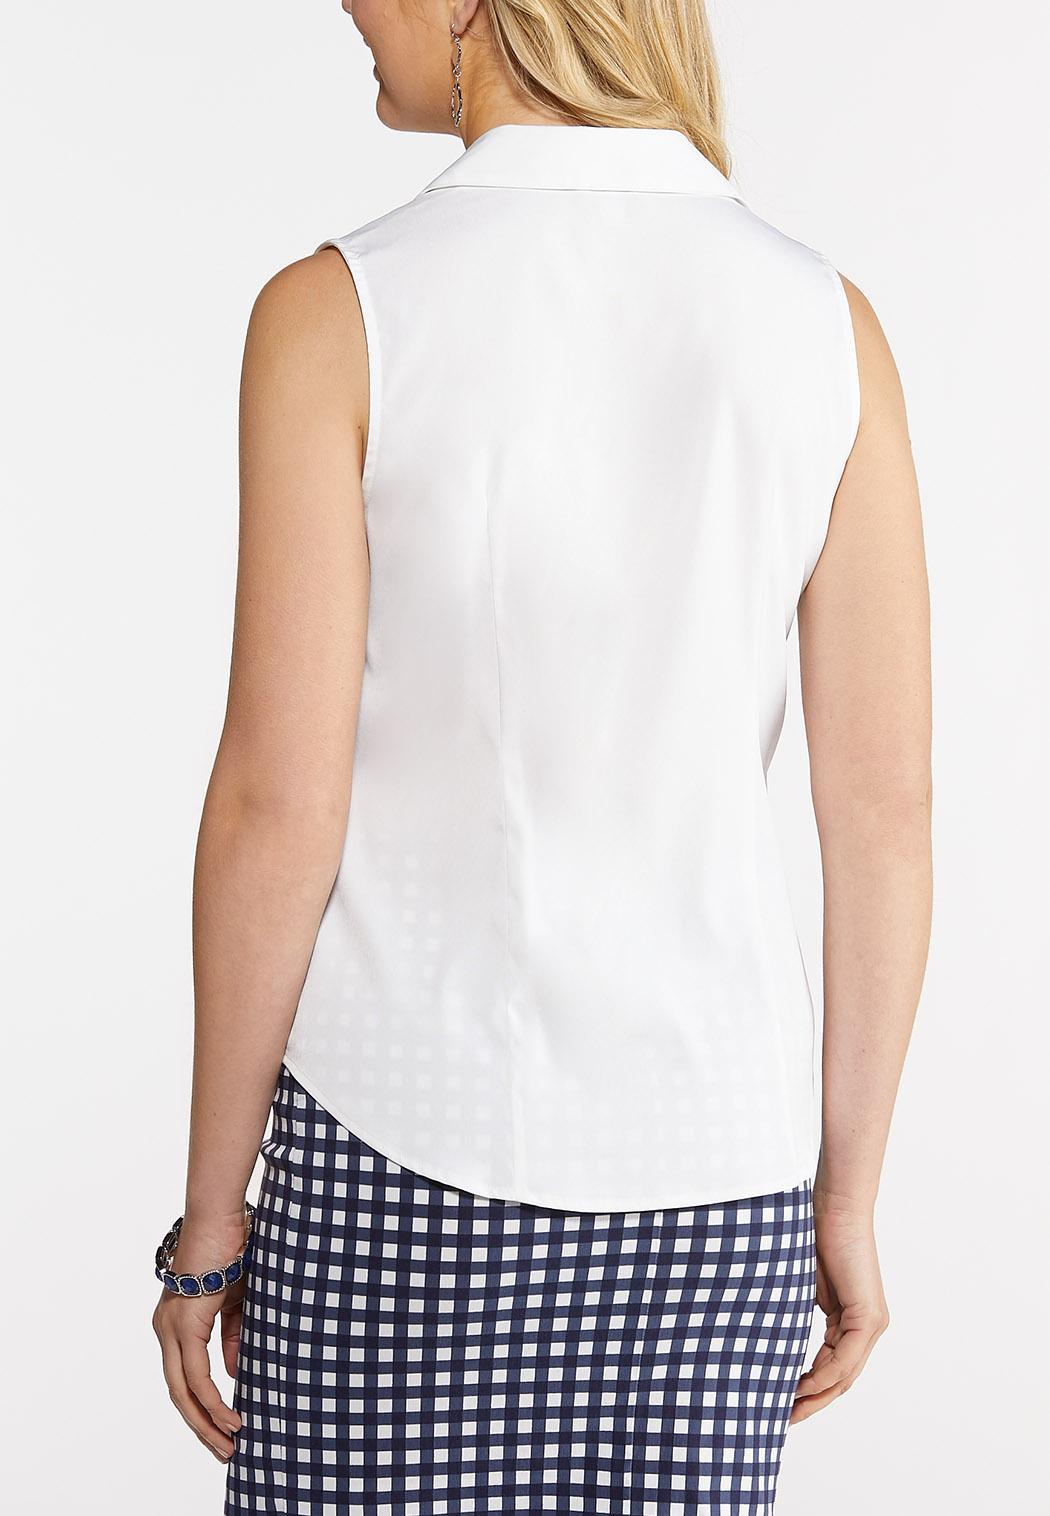 Button Down Collar Tank (Item #43844947)